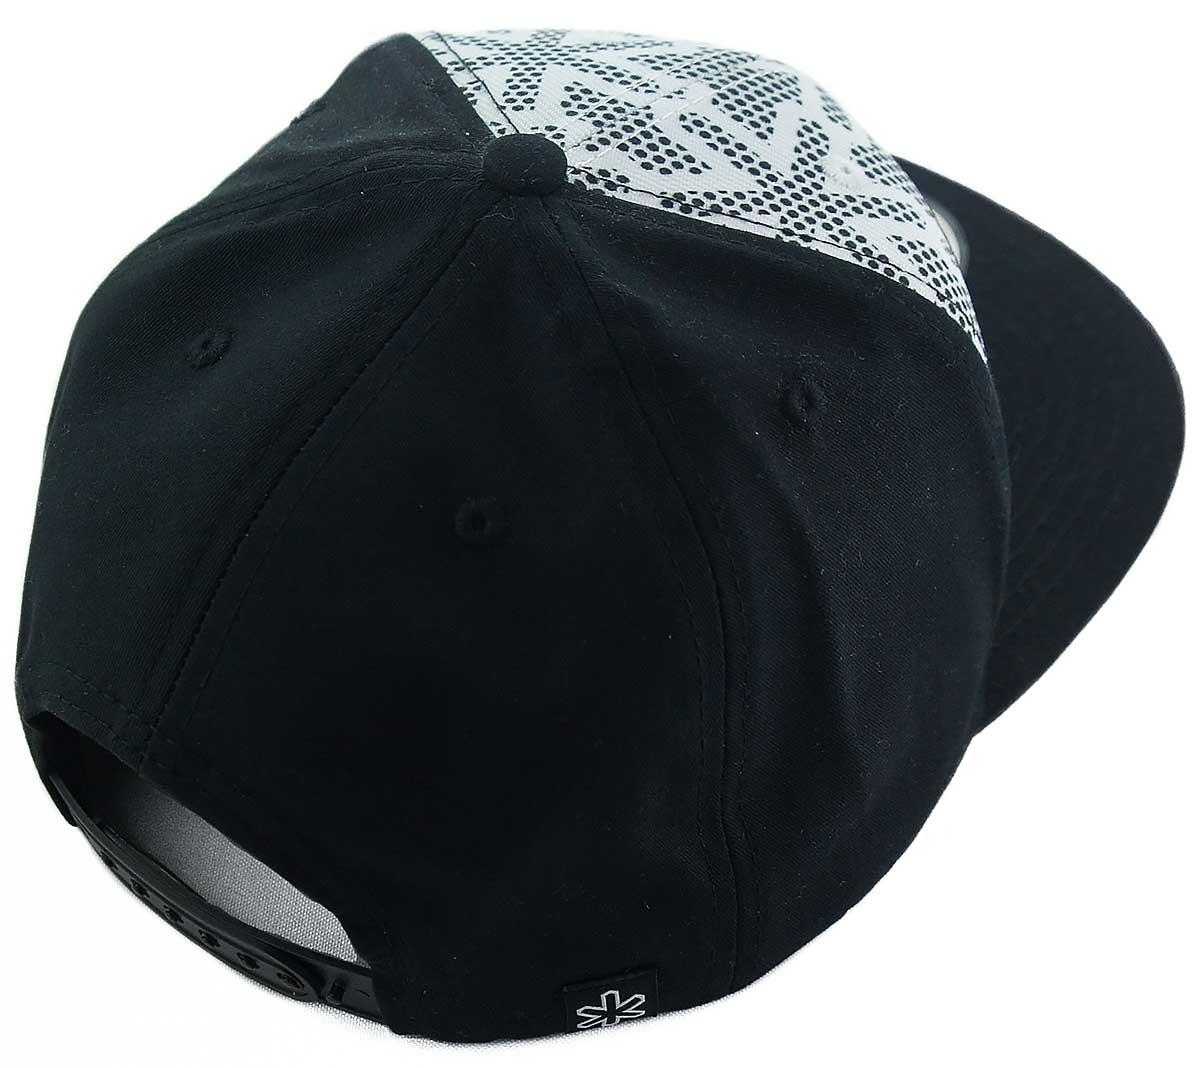 Boné Tuff Star Black Snapback - Branco/Preto